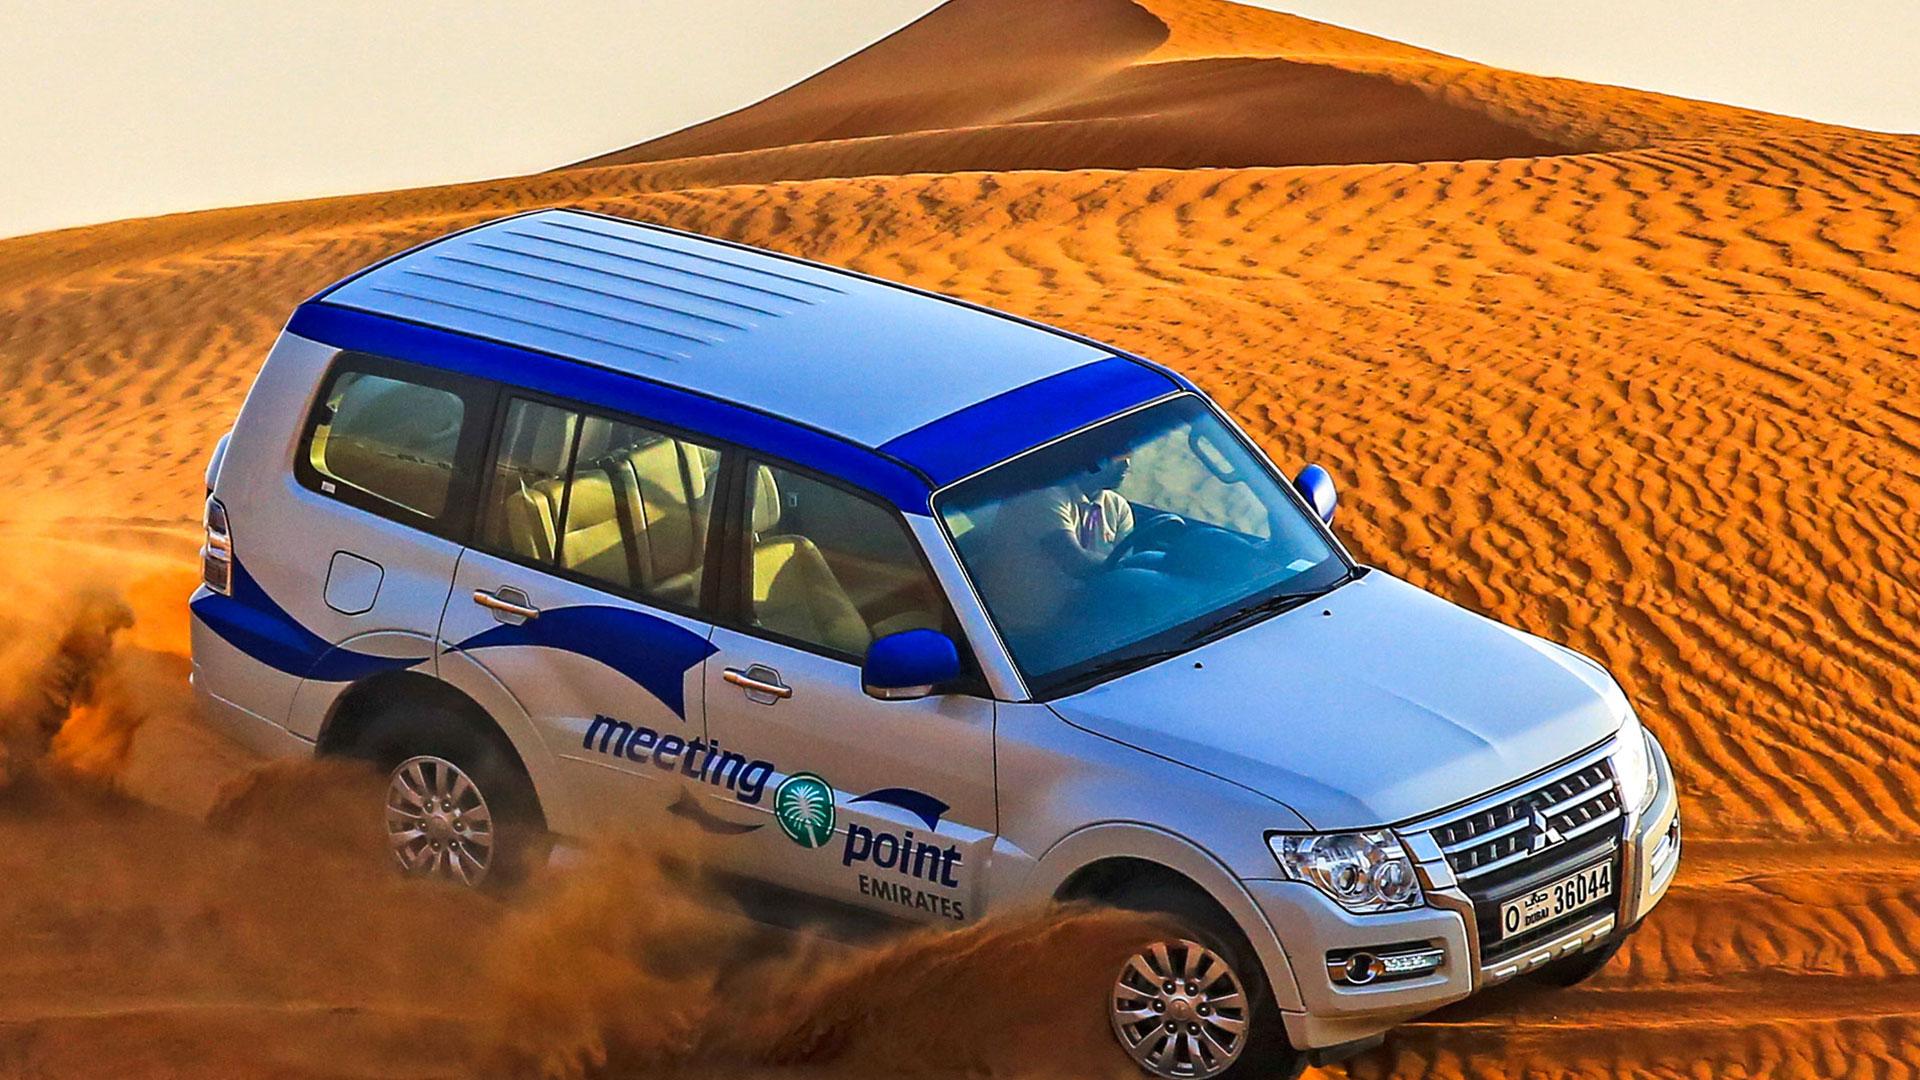 Emirates | Meeting Point International